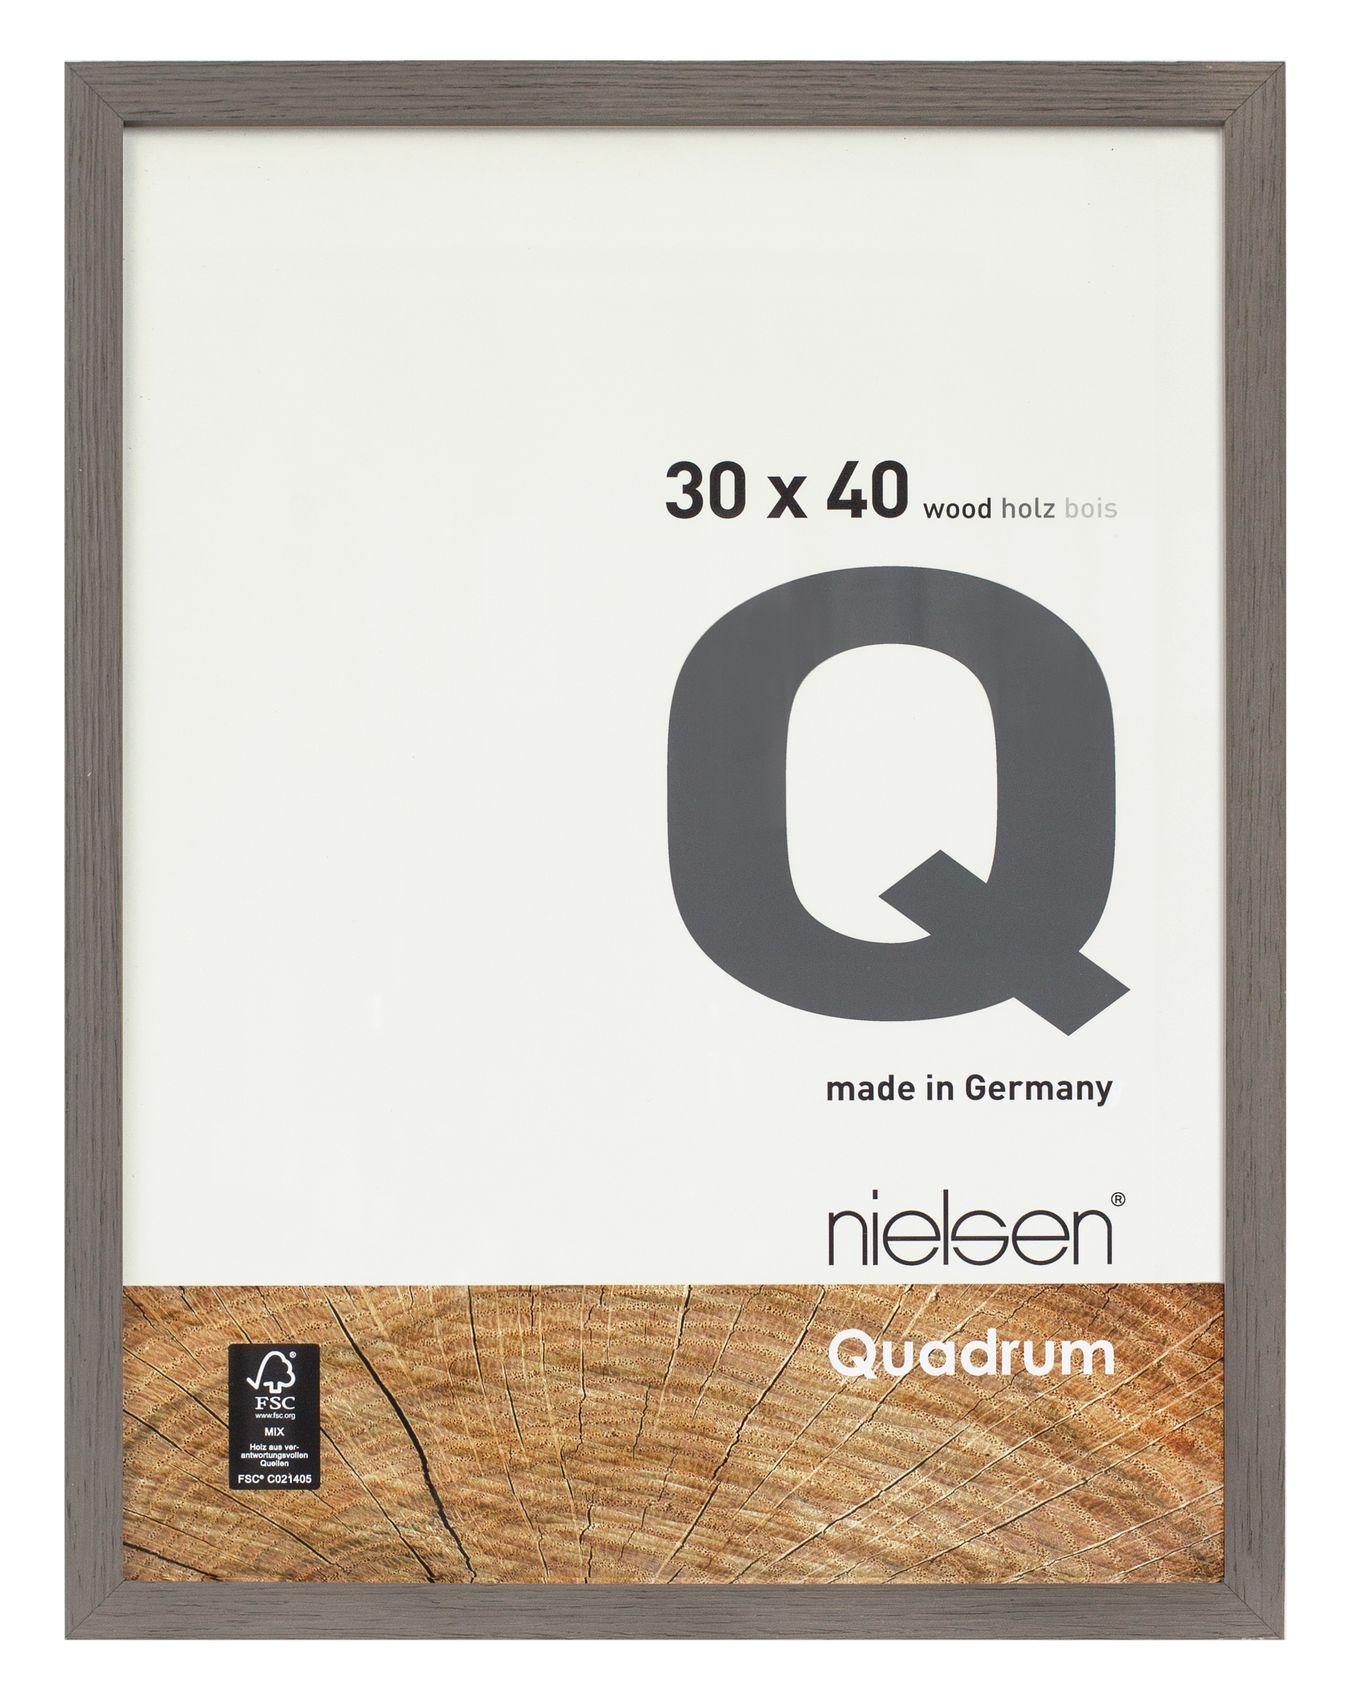 Nielsen Quadrum 42x59.4cm A2 Veneer Grey Wood Picture Frame ...